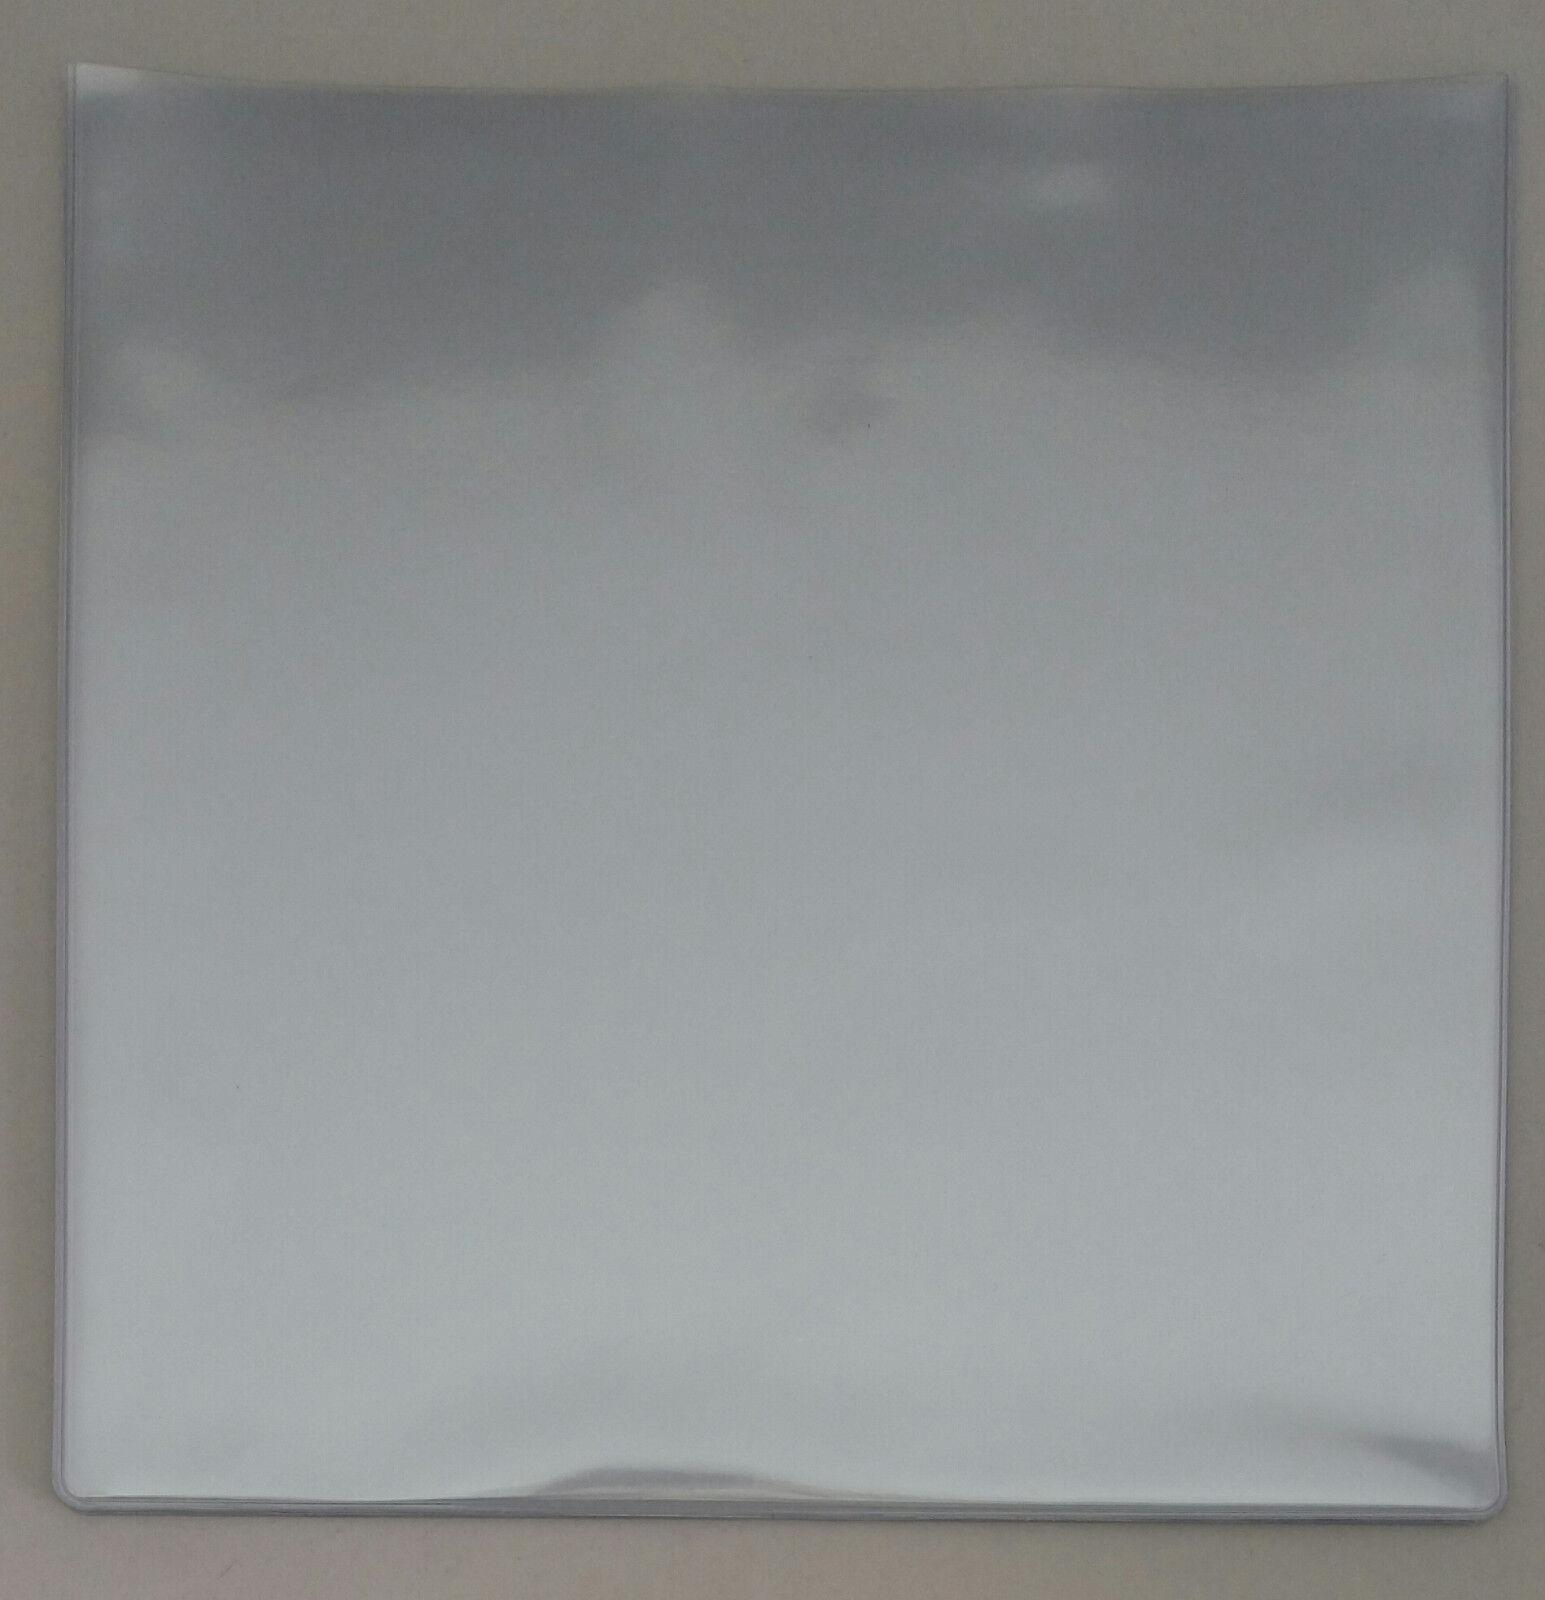 7 Inch 12 Inch PVC Record Sleeves Clear /& Orange Peel Thumb Cut 180//140 Micron